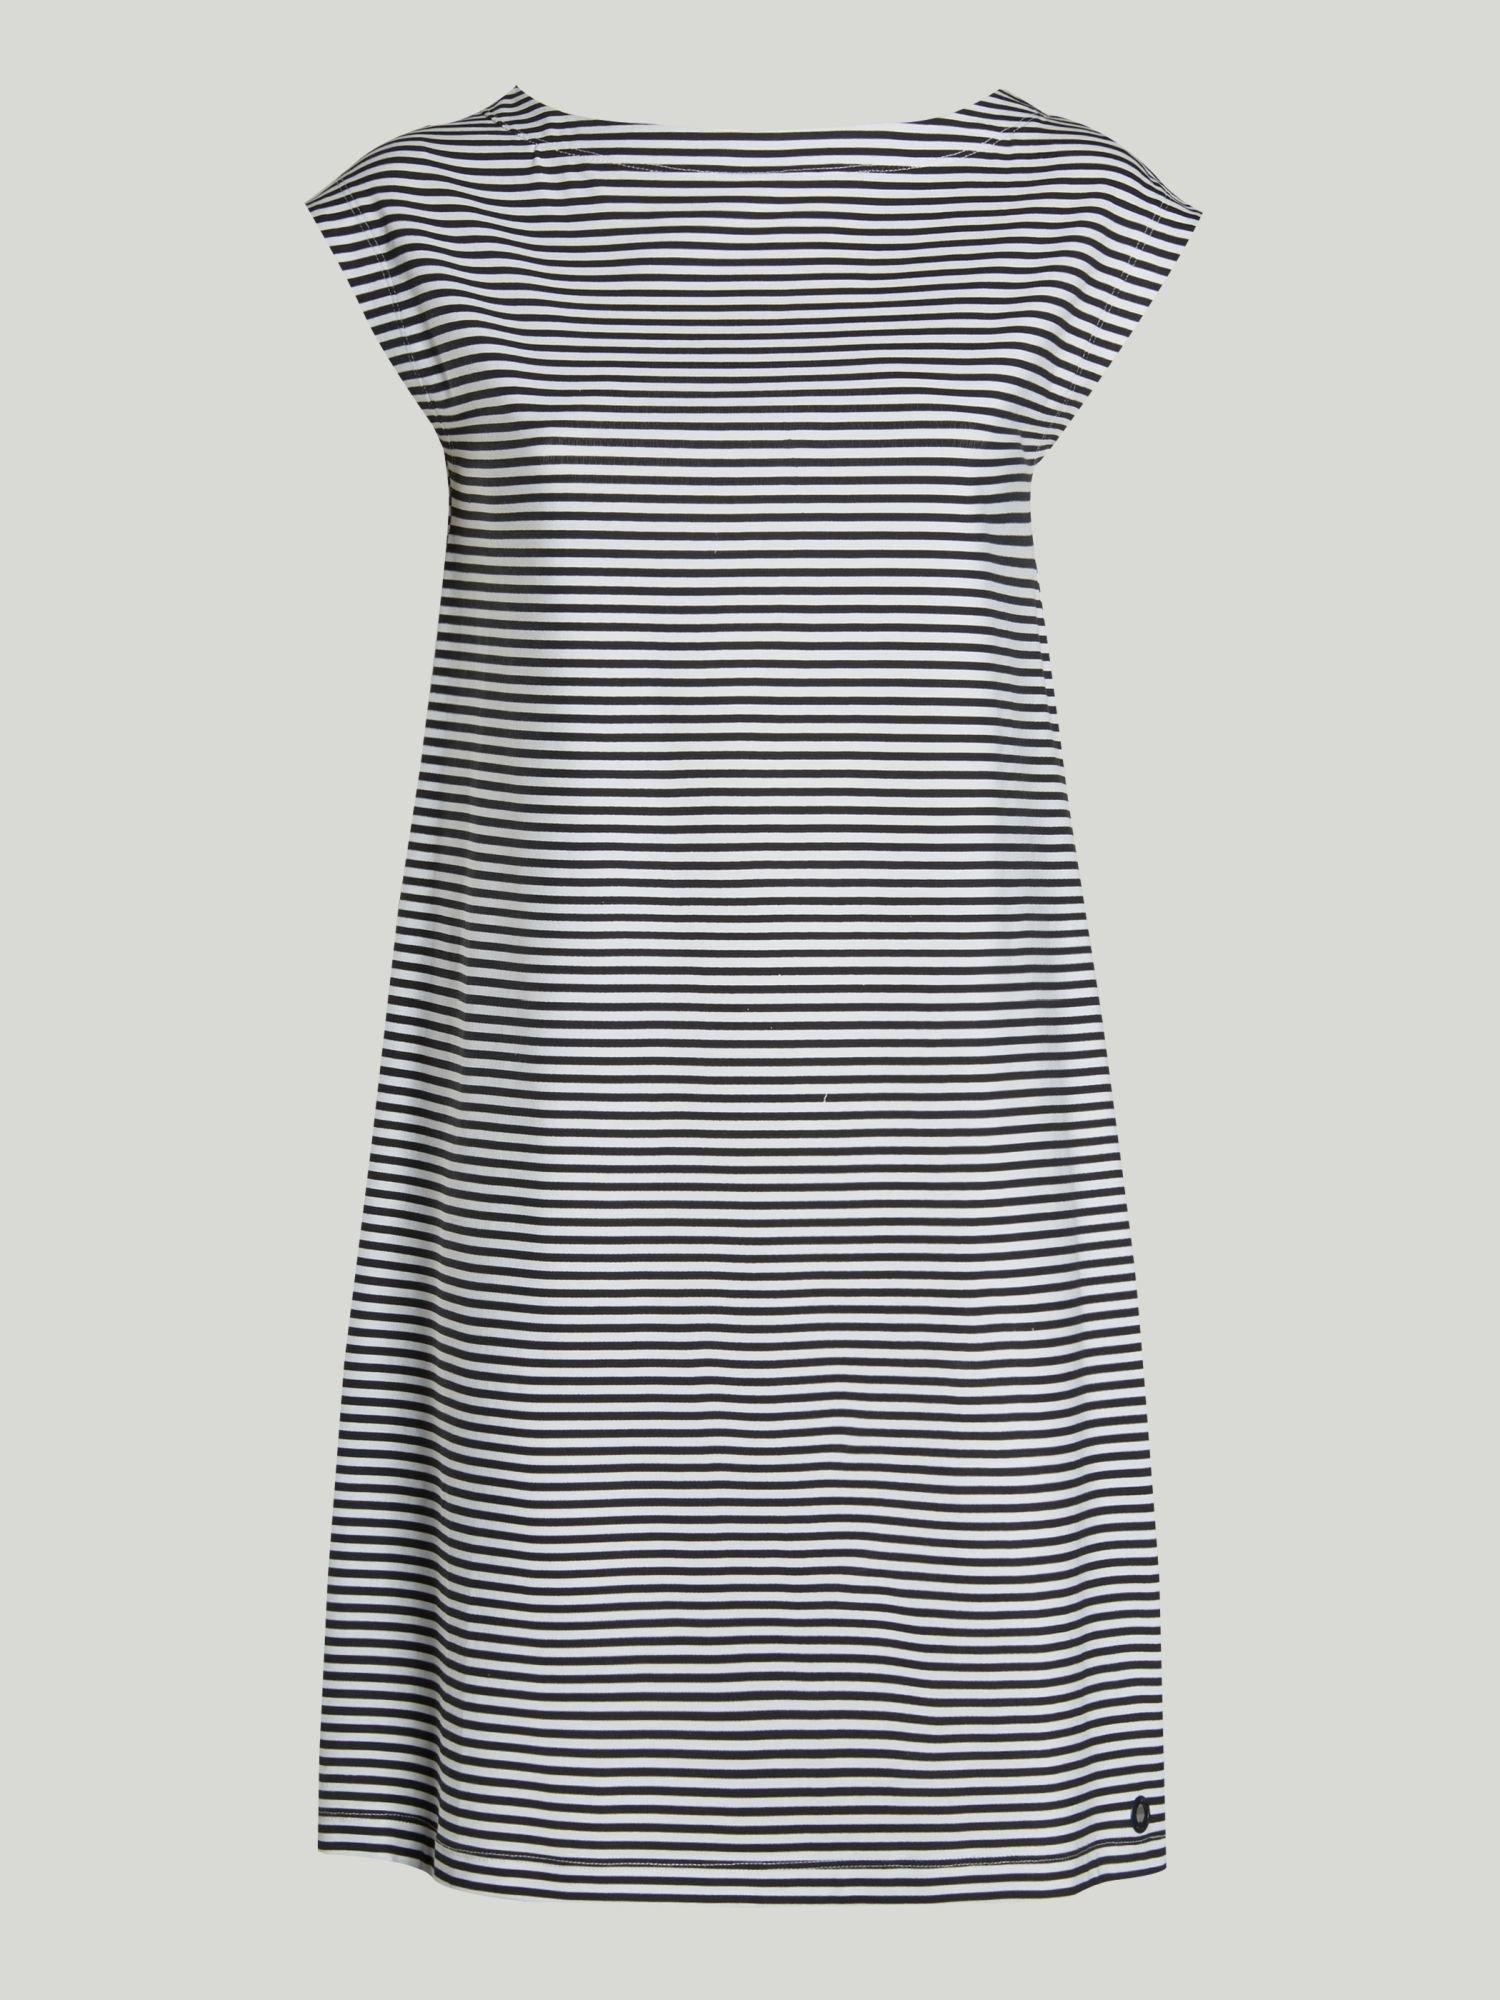 Dress A48 - Navy / White